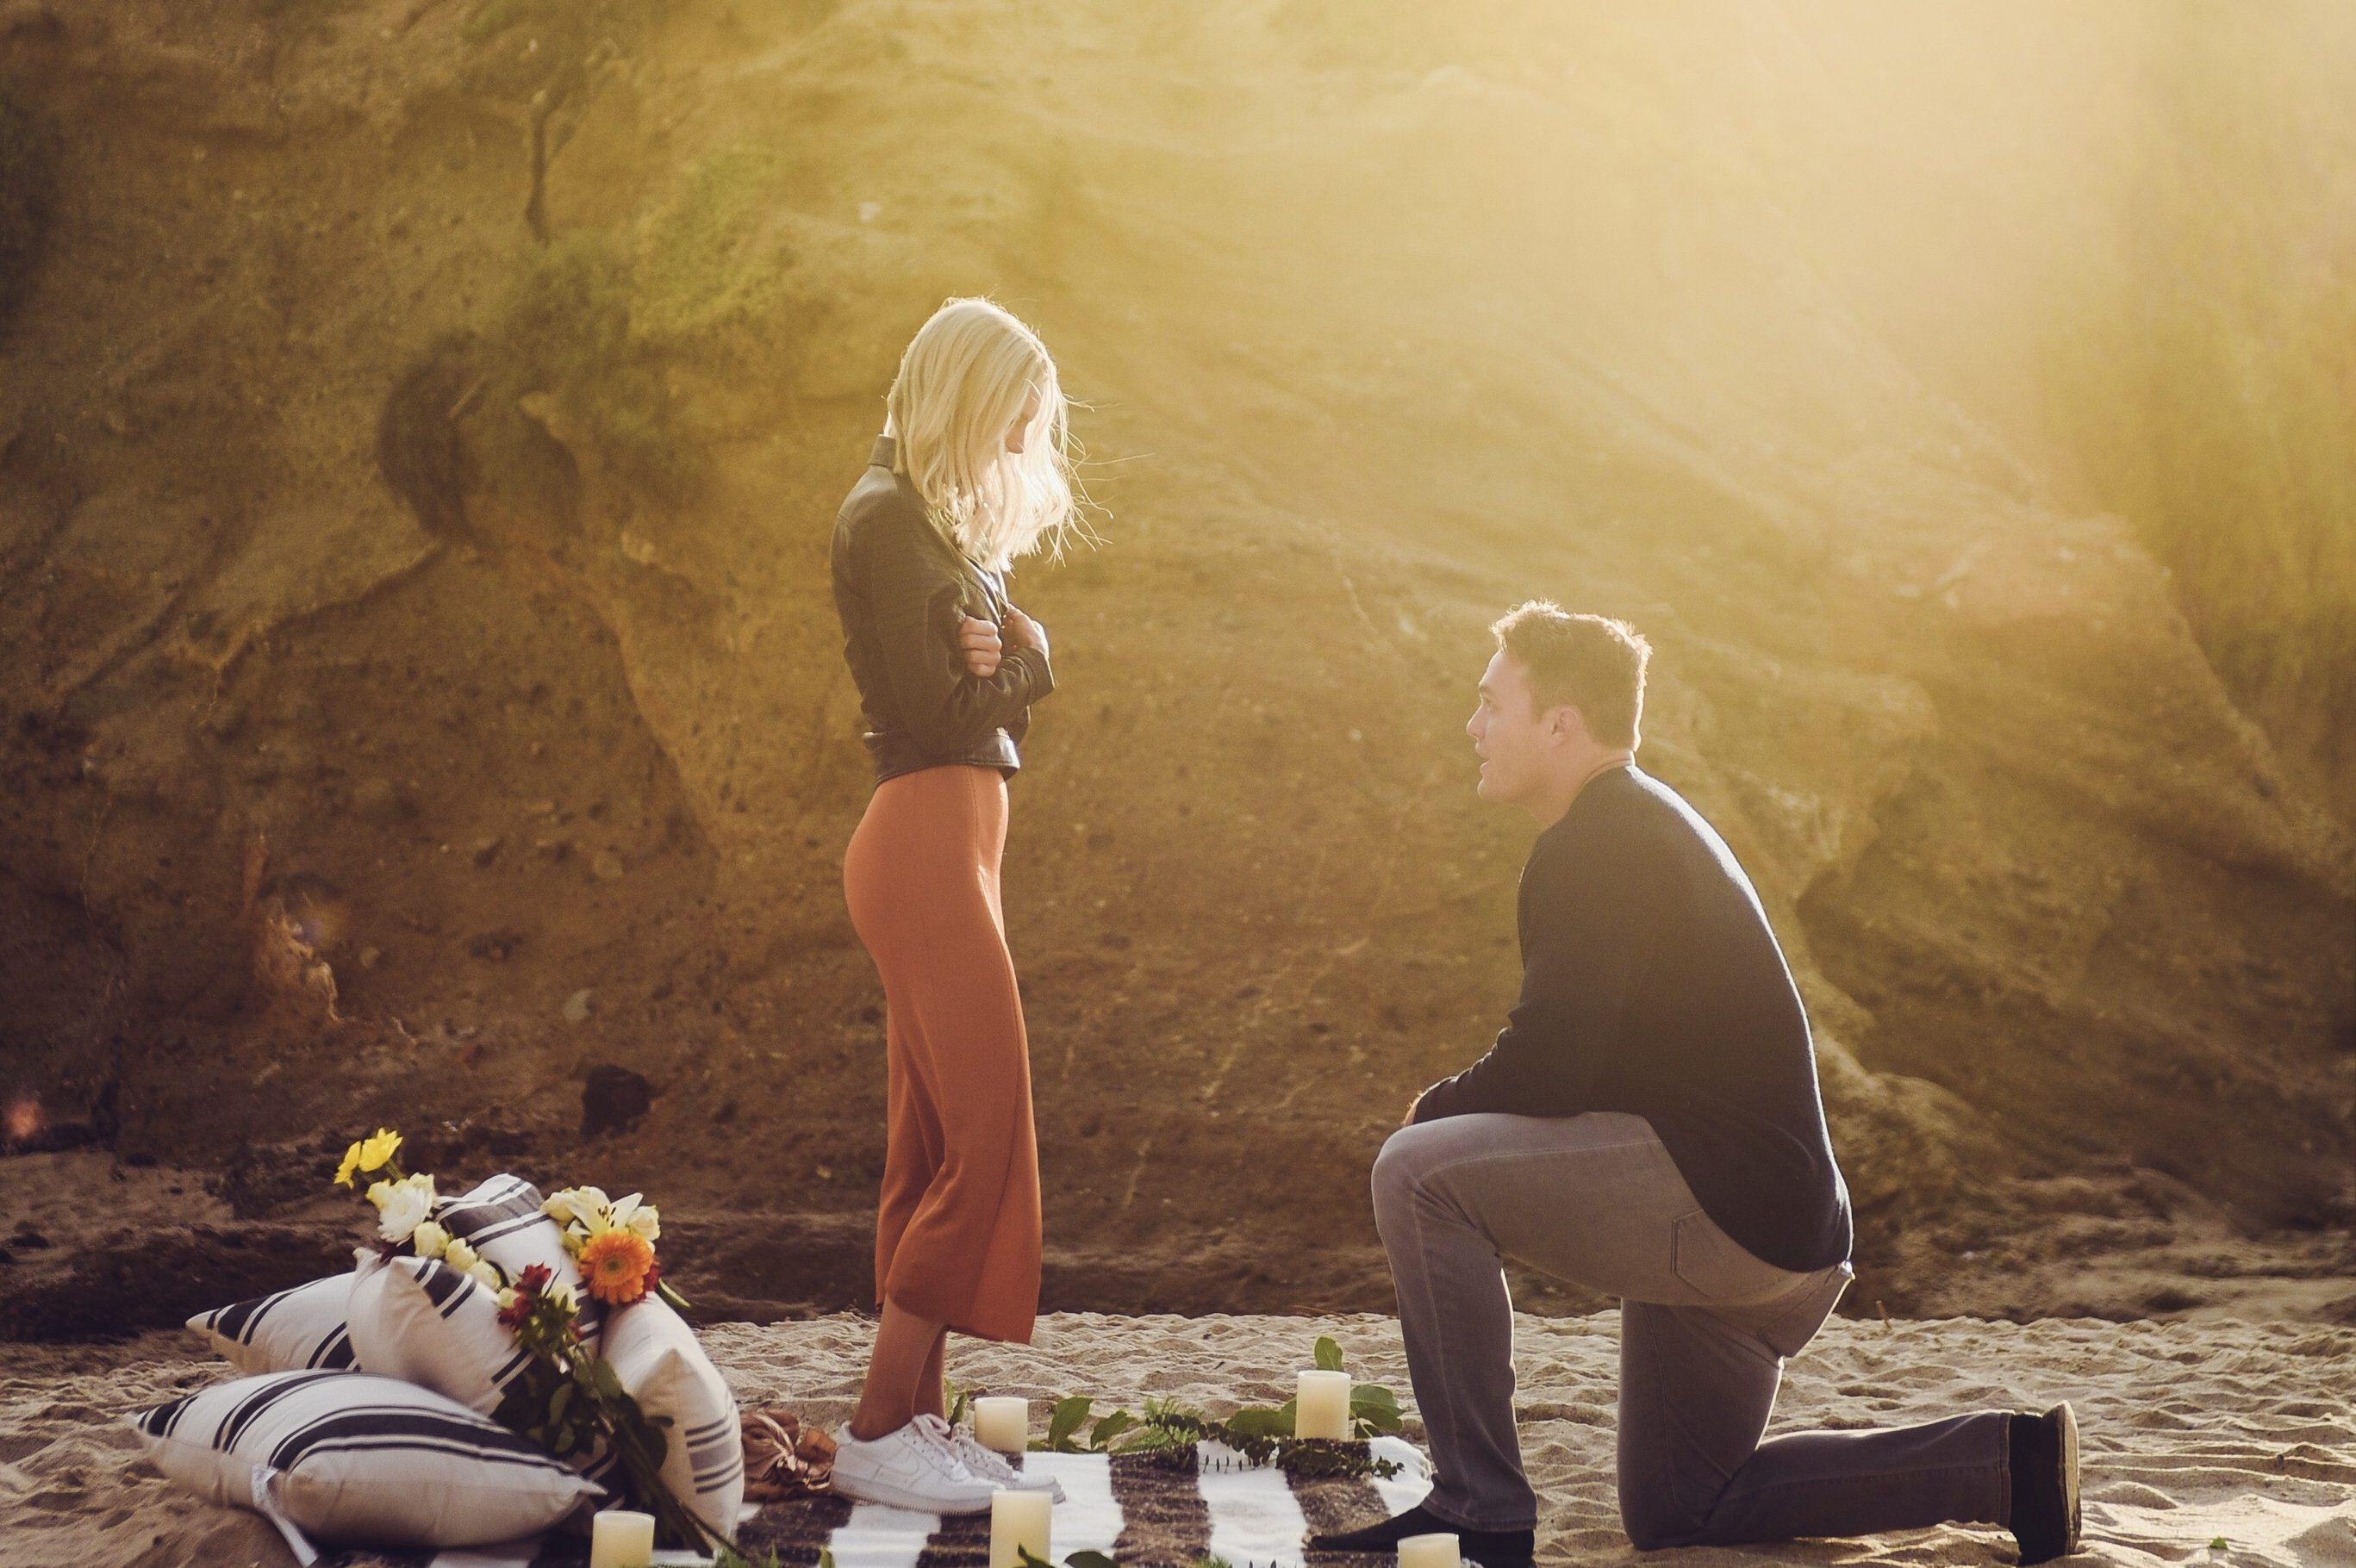 Engagement Proposal Ideas in Laguna Beach, CA